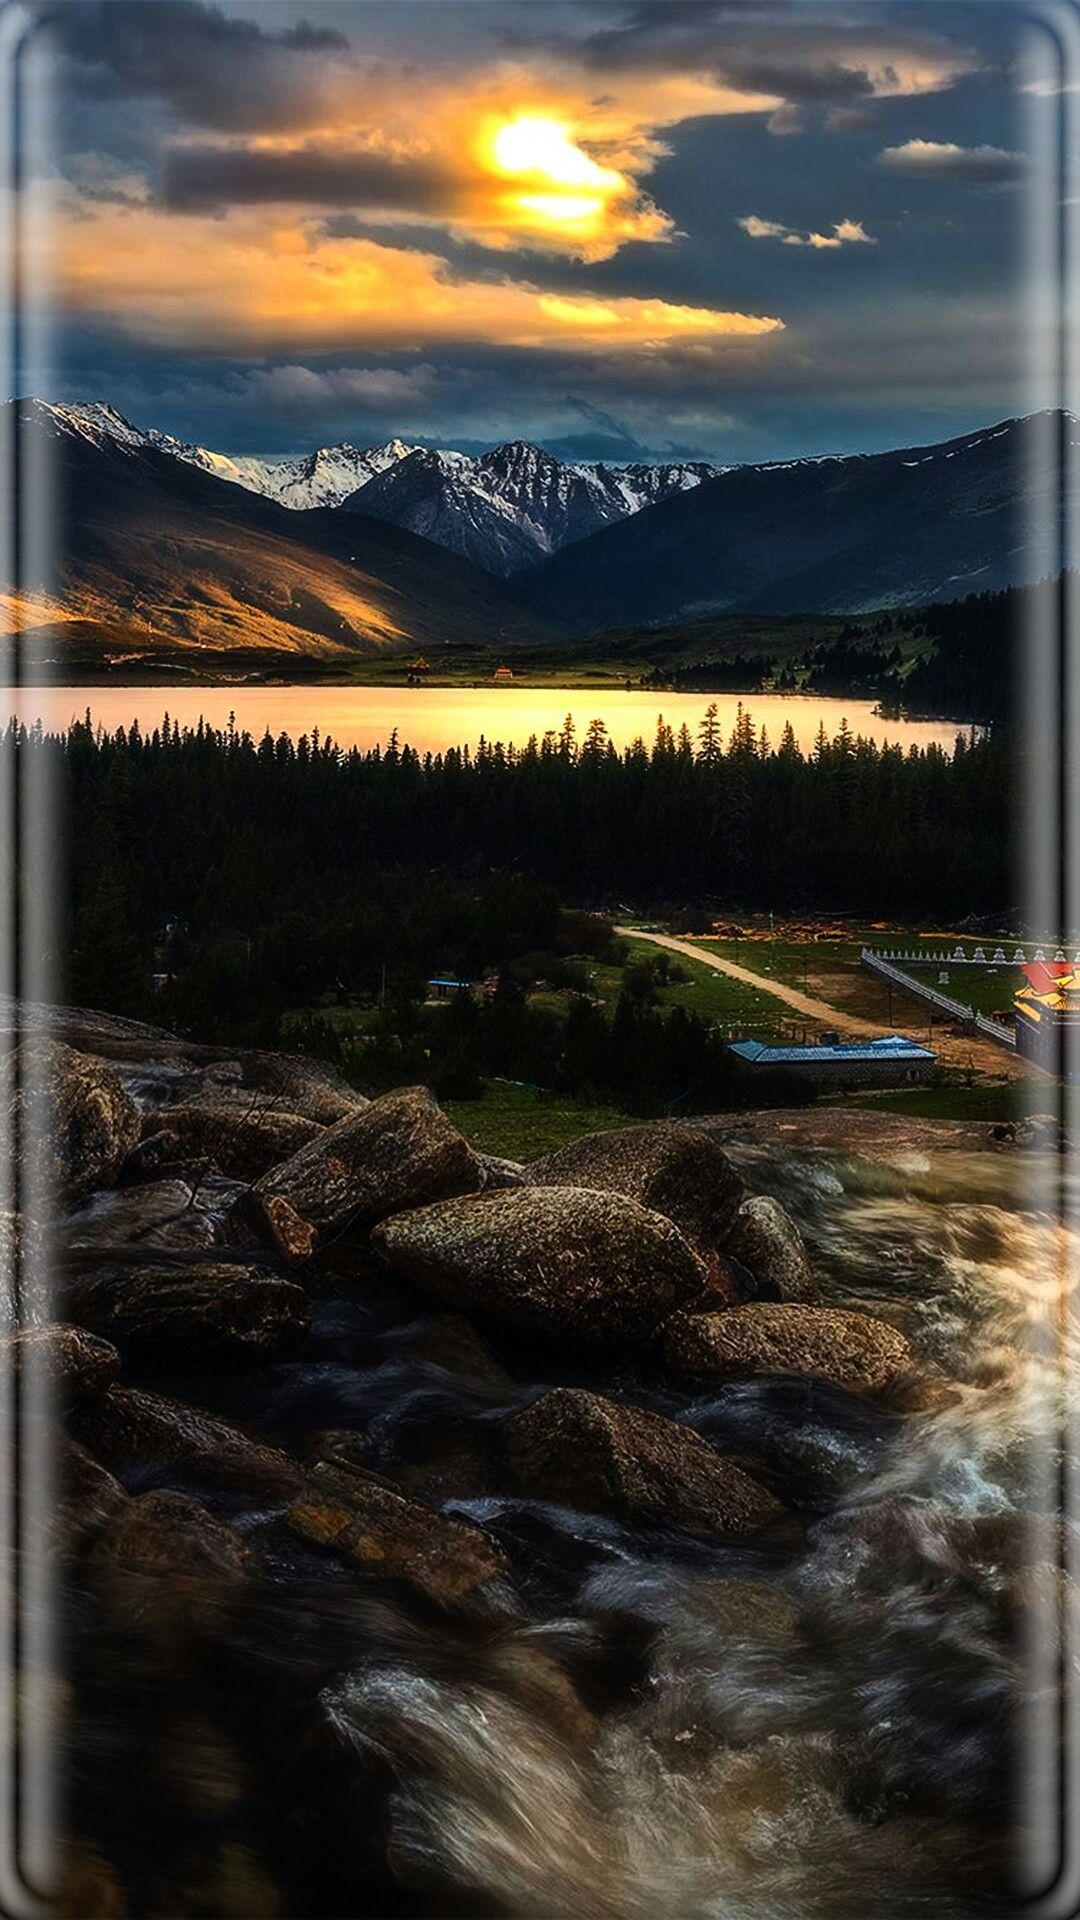 Mountain and Creek Wallpaper Lenovo wallpapers